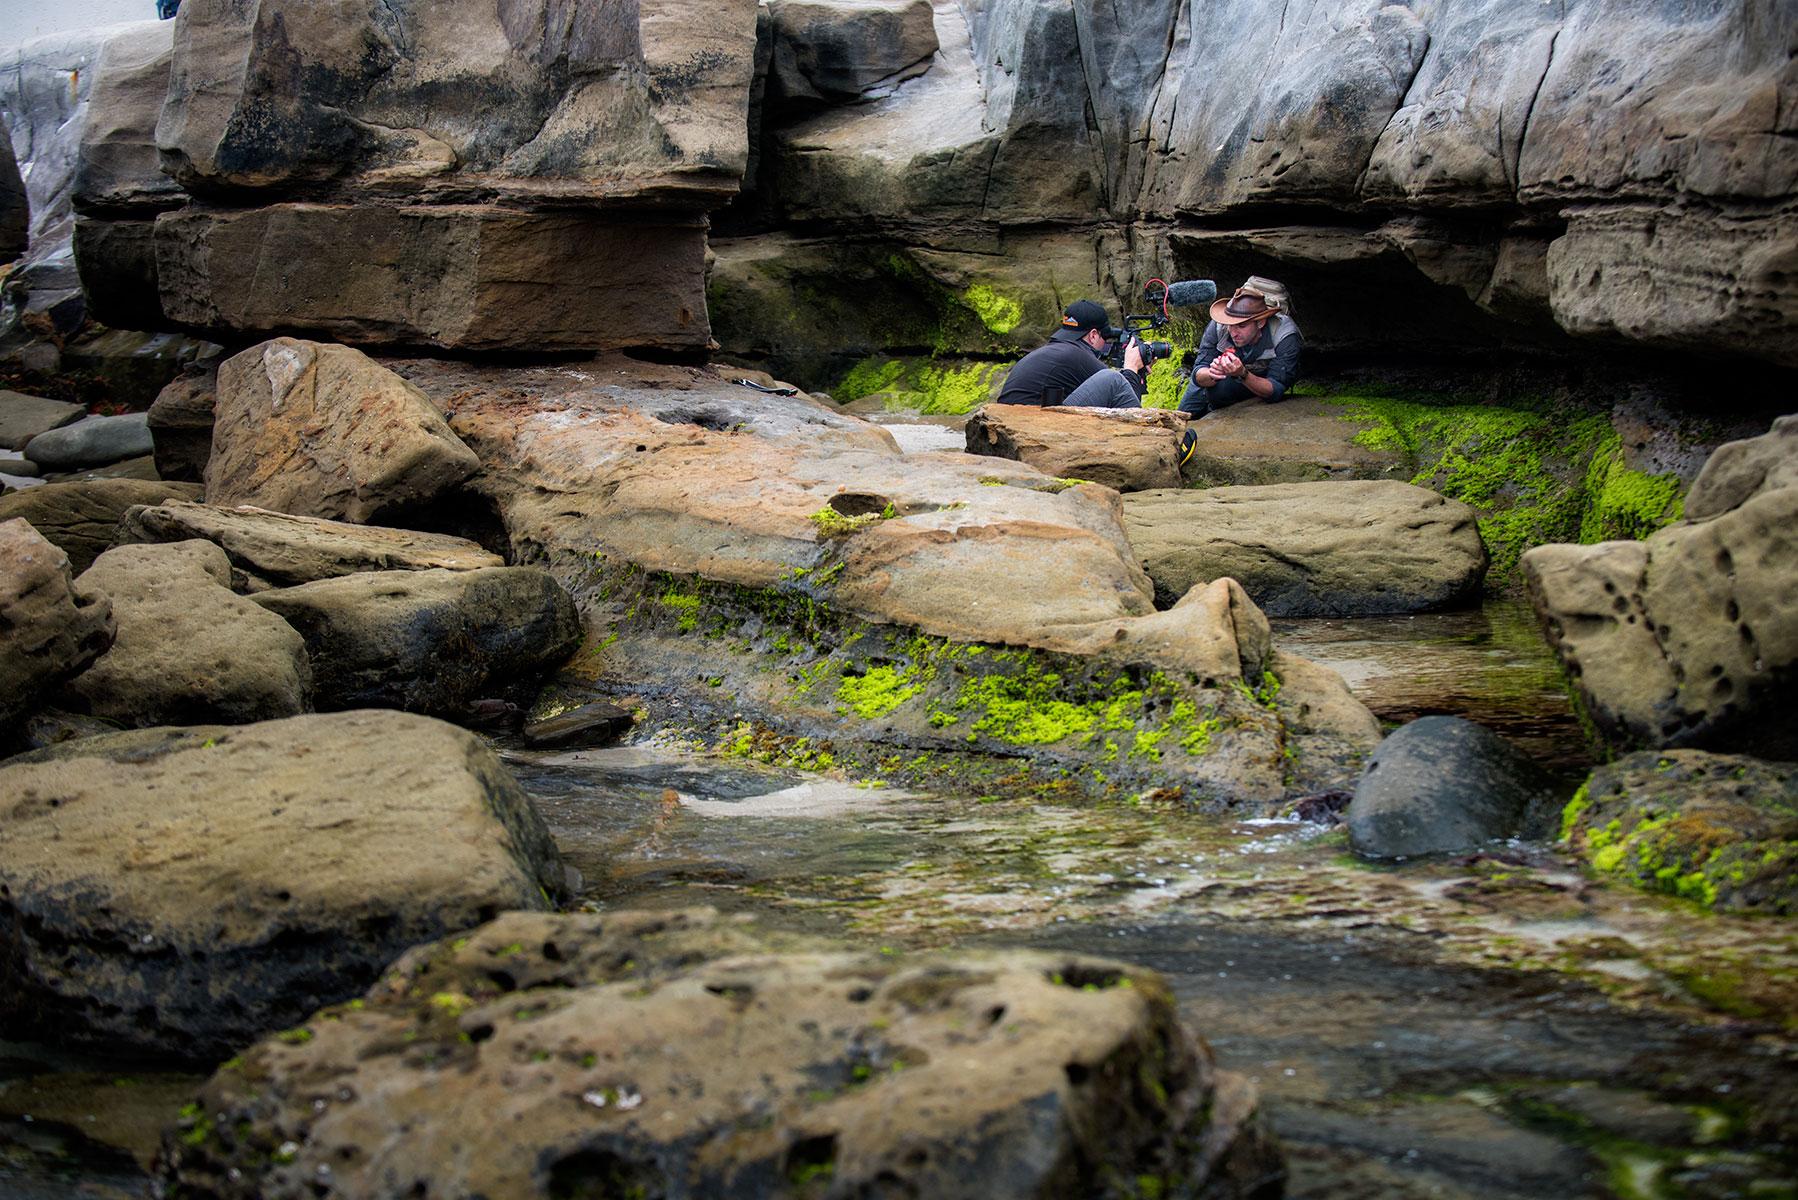 austin-trigg-brave-wilderness-la-jolla-california-reef-filming.jpg